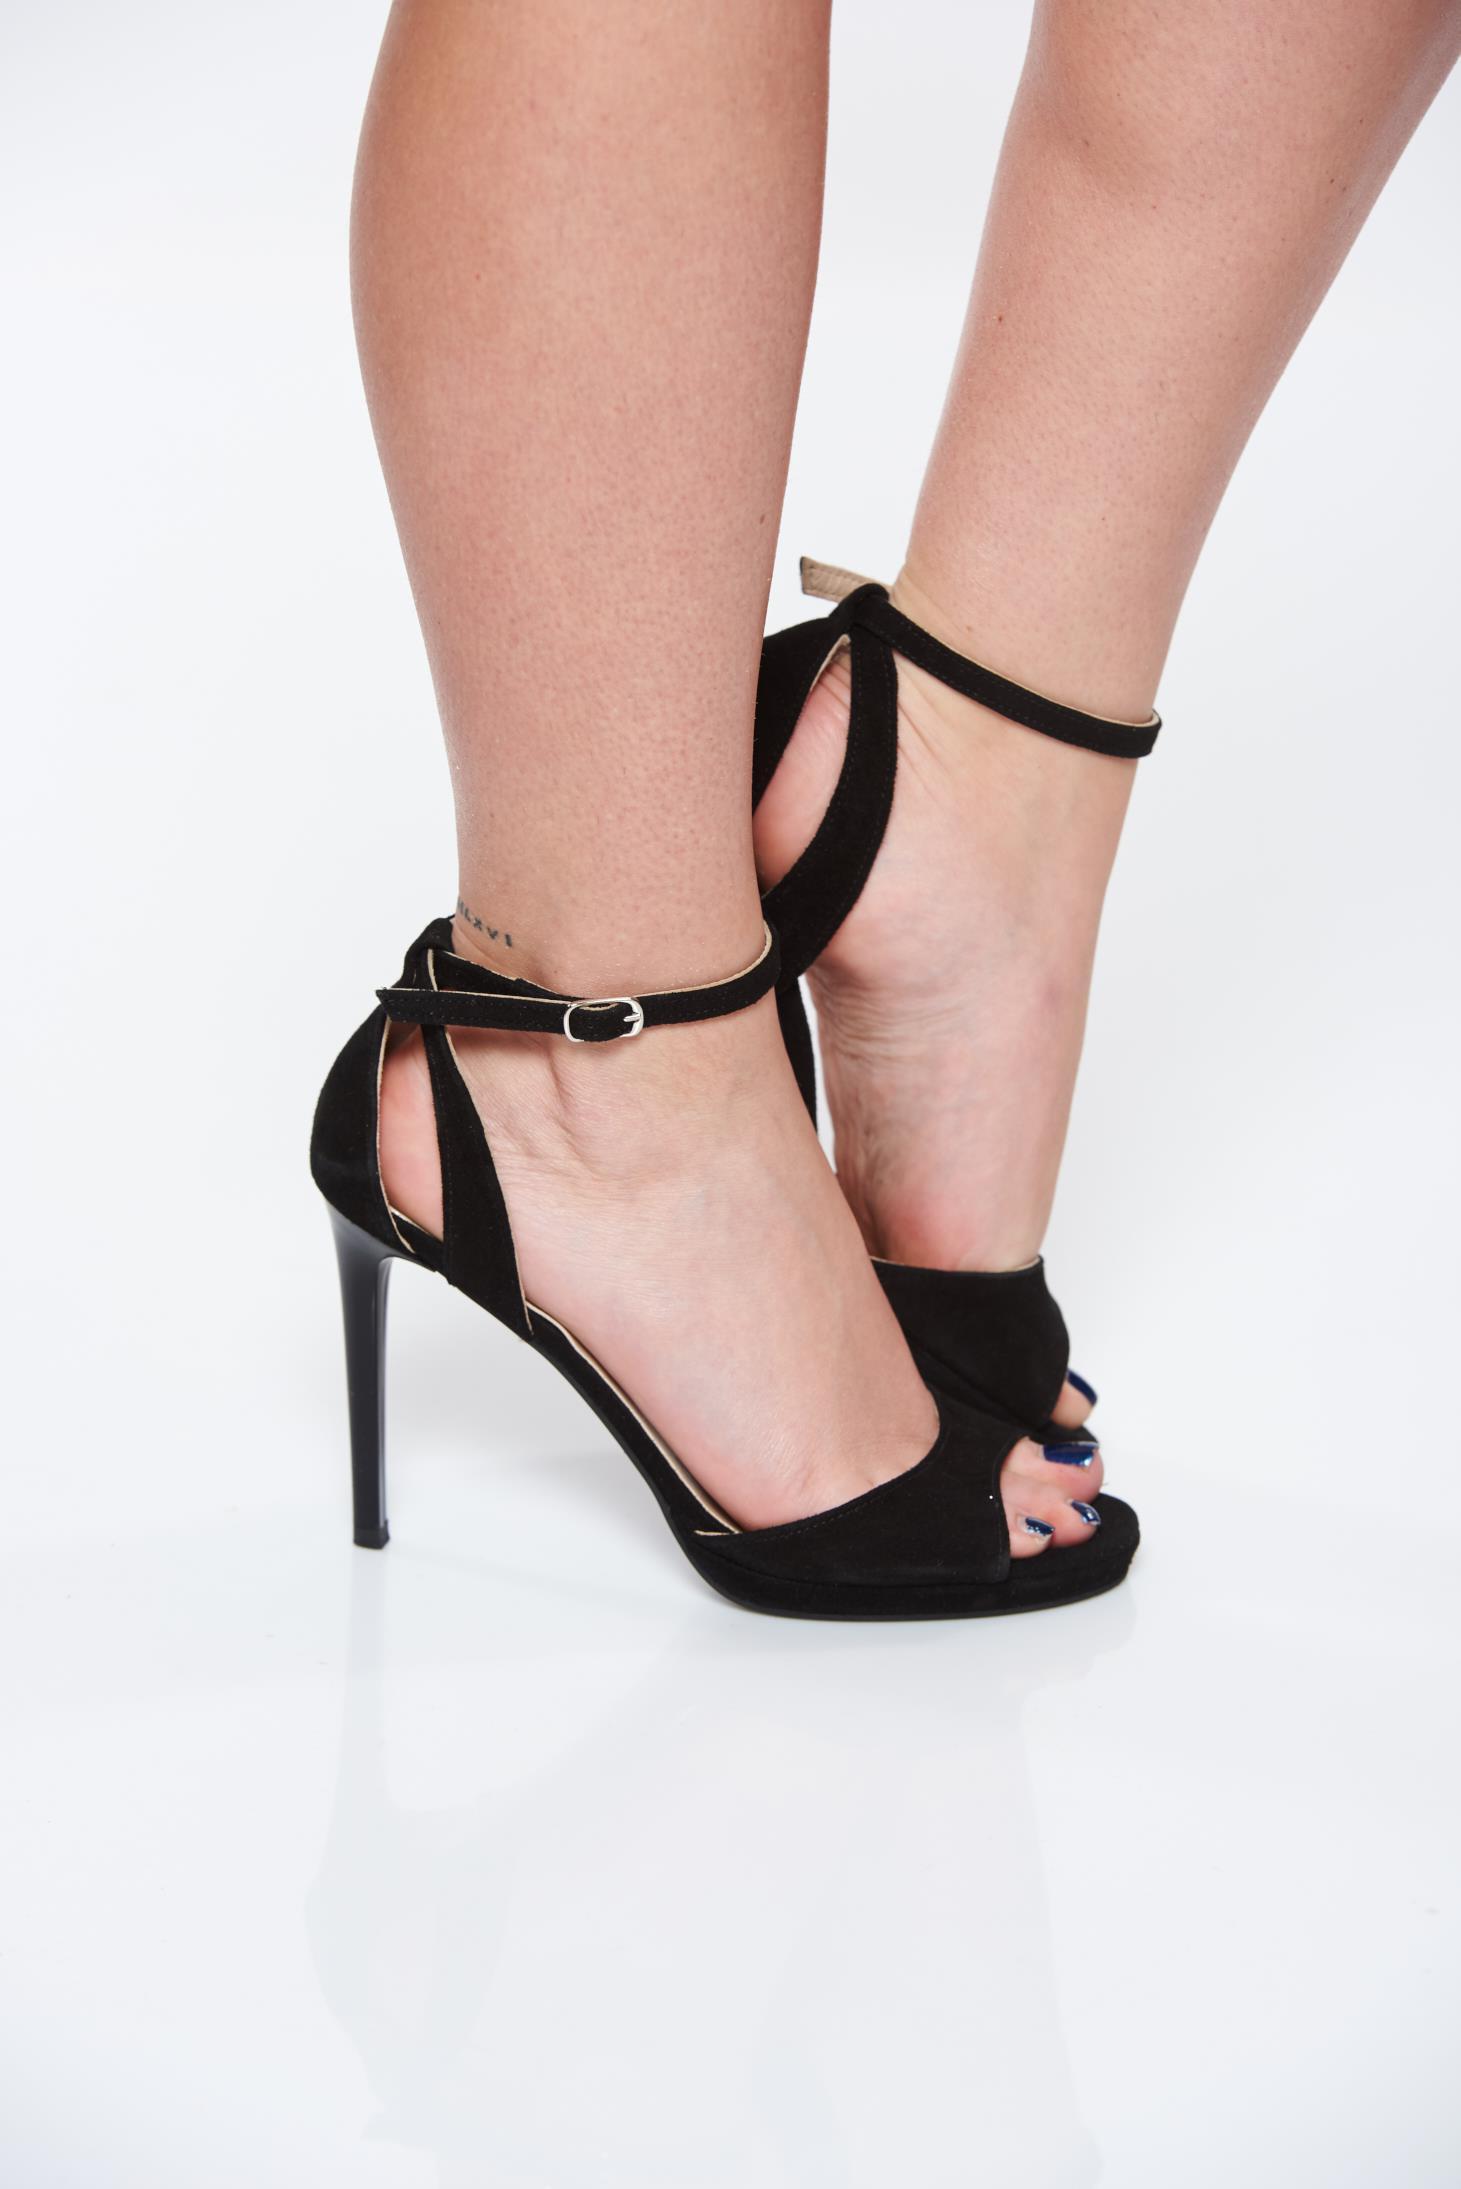 Sandale negre elegante din piele naturala cu toc inalt si